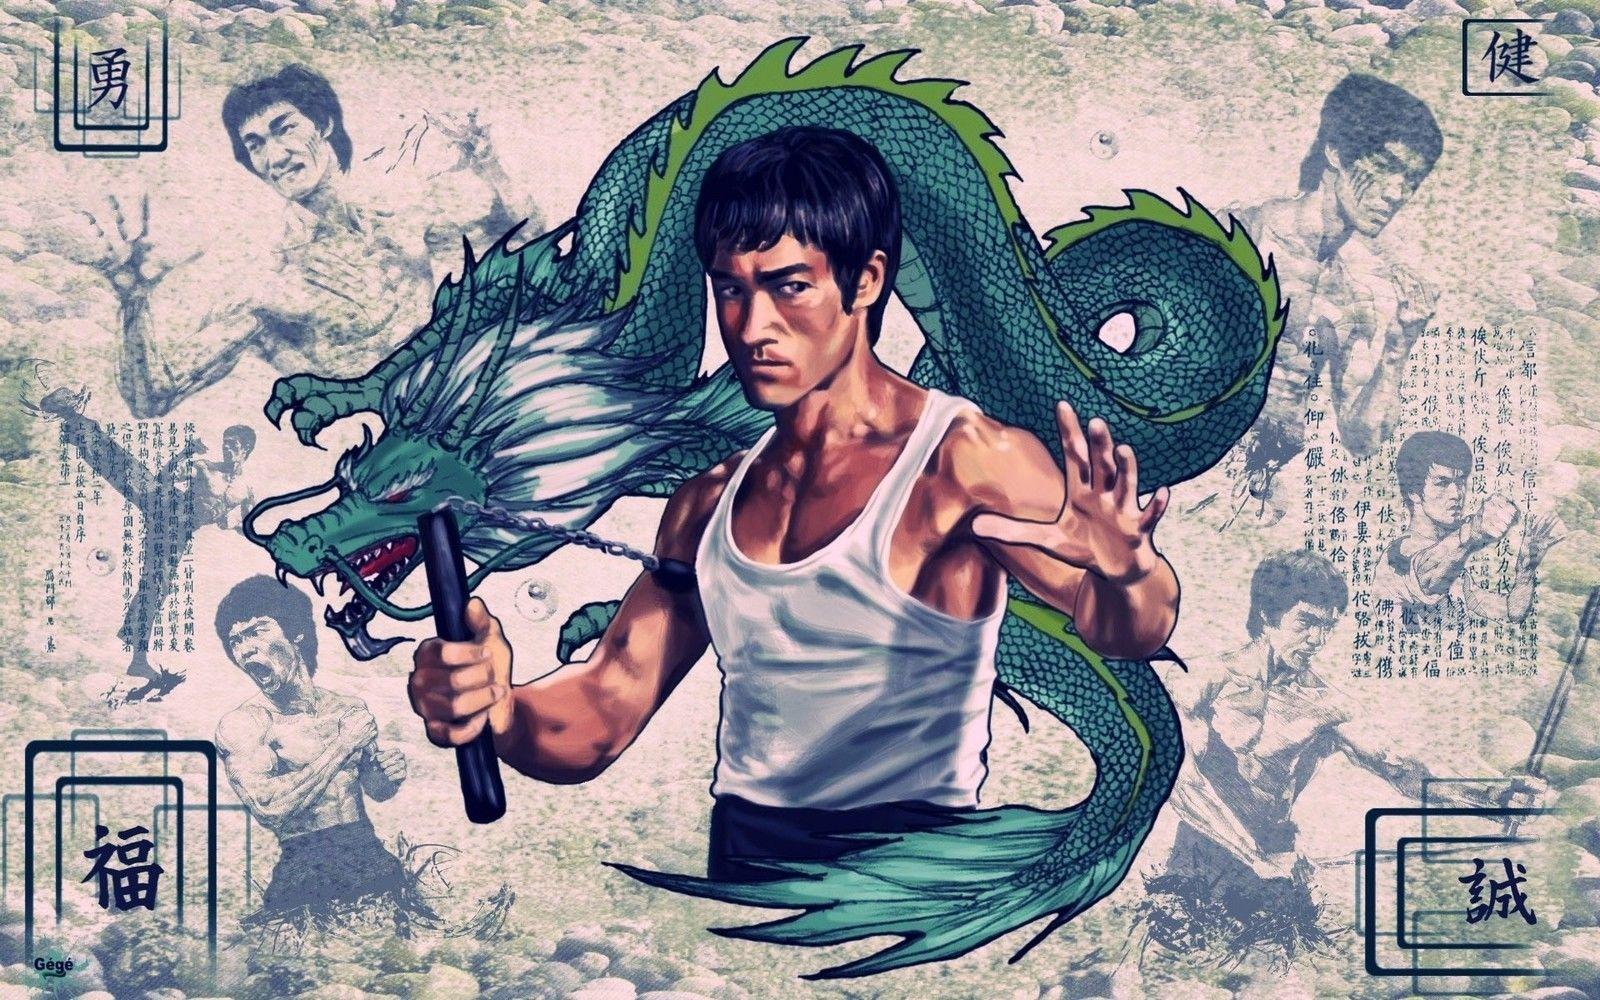 Bruce Lee Kung Fu Movie Poster Poster Art Print Film 50 70cm China Mainland Bruce Lee Art Bruce Lee Martial Arts Bruce Lee